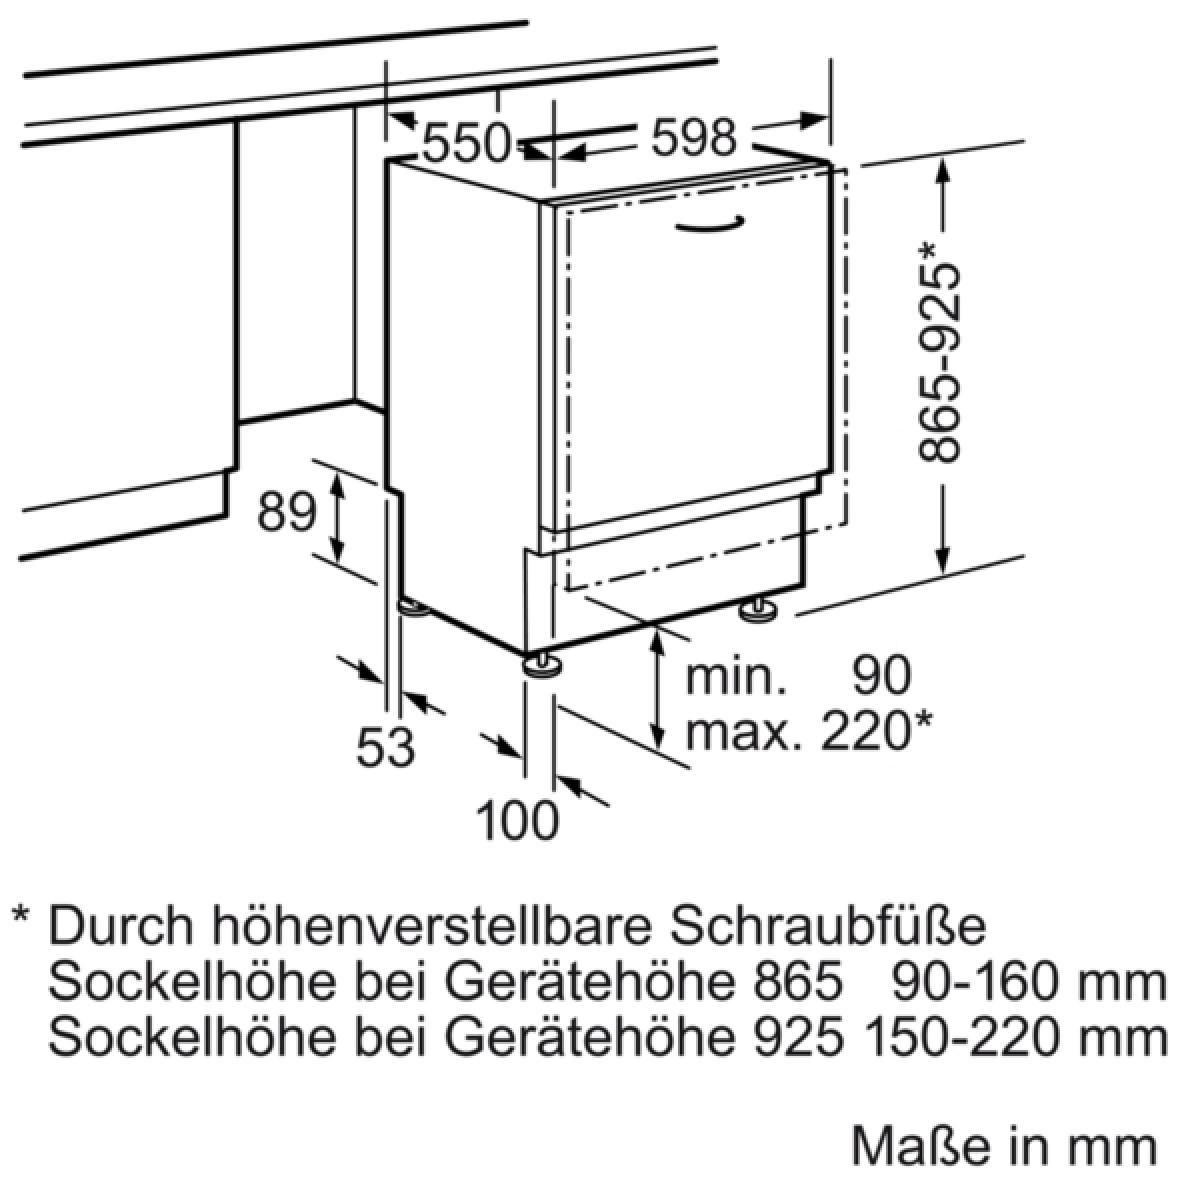 siemens sx636x00ce speedmatic gro raum geschirrsp ler 60 cm vollintegrierbar g nstig kaufen. Black Bedroom Furniture Sets. Home Design Ideas